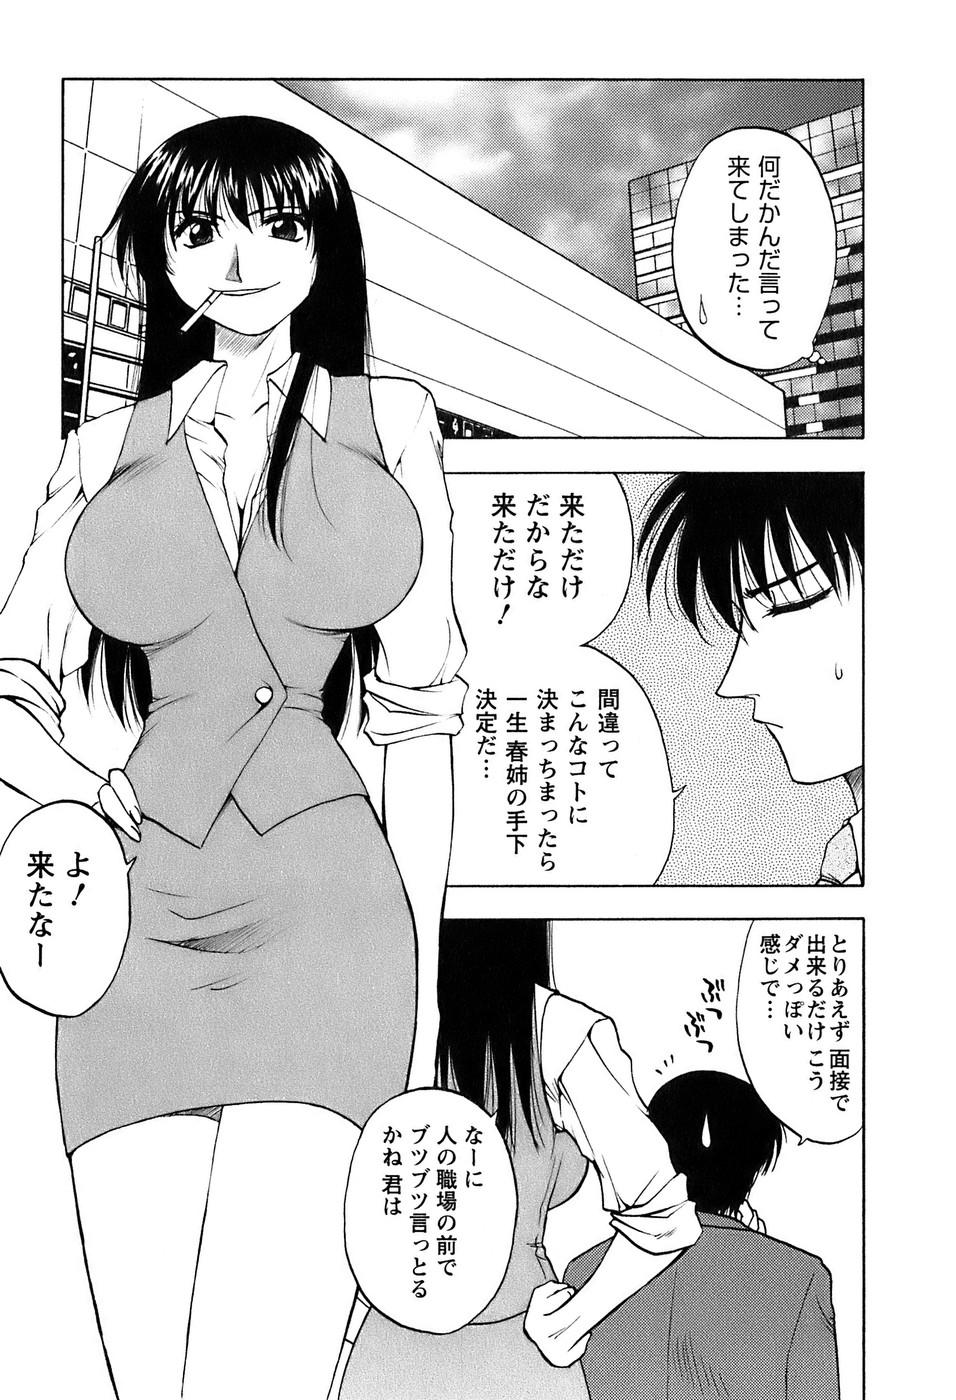 Okusan Volley - Madam Volleyball 159